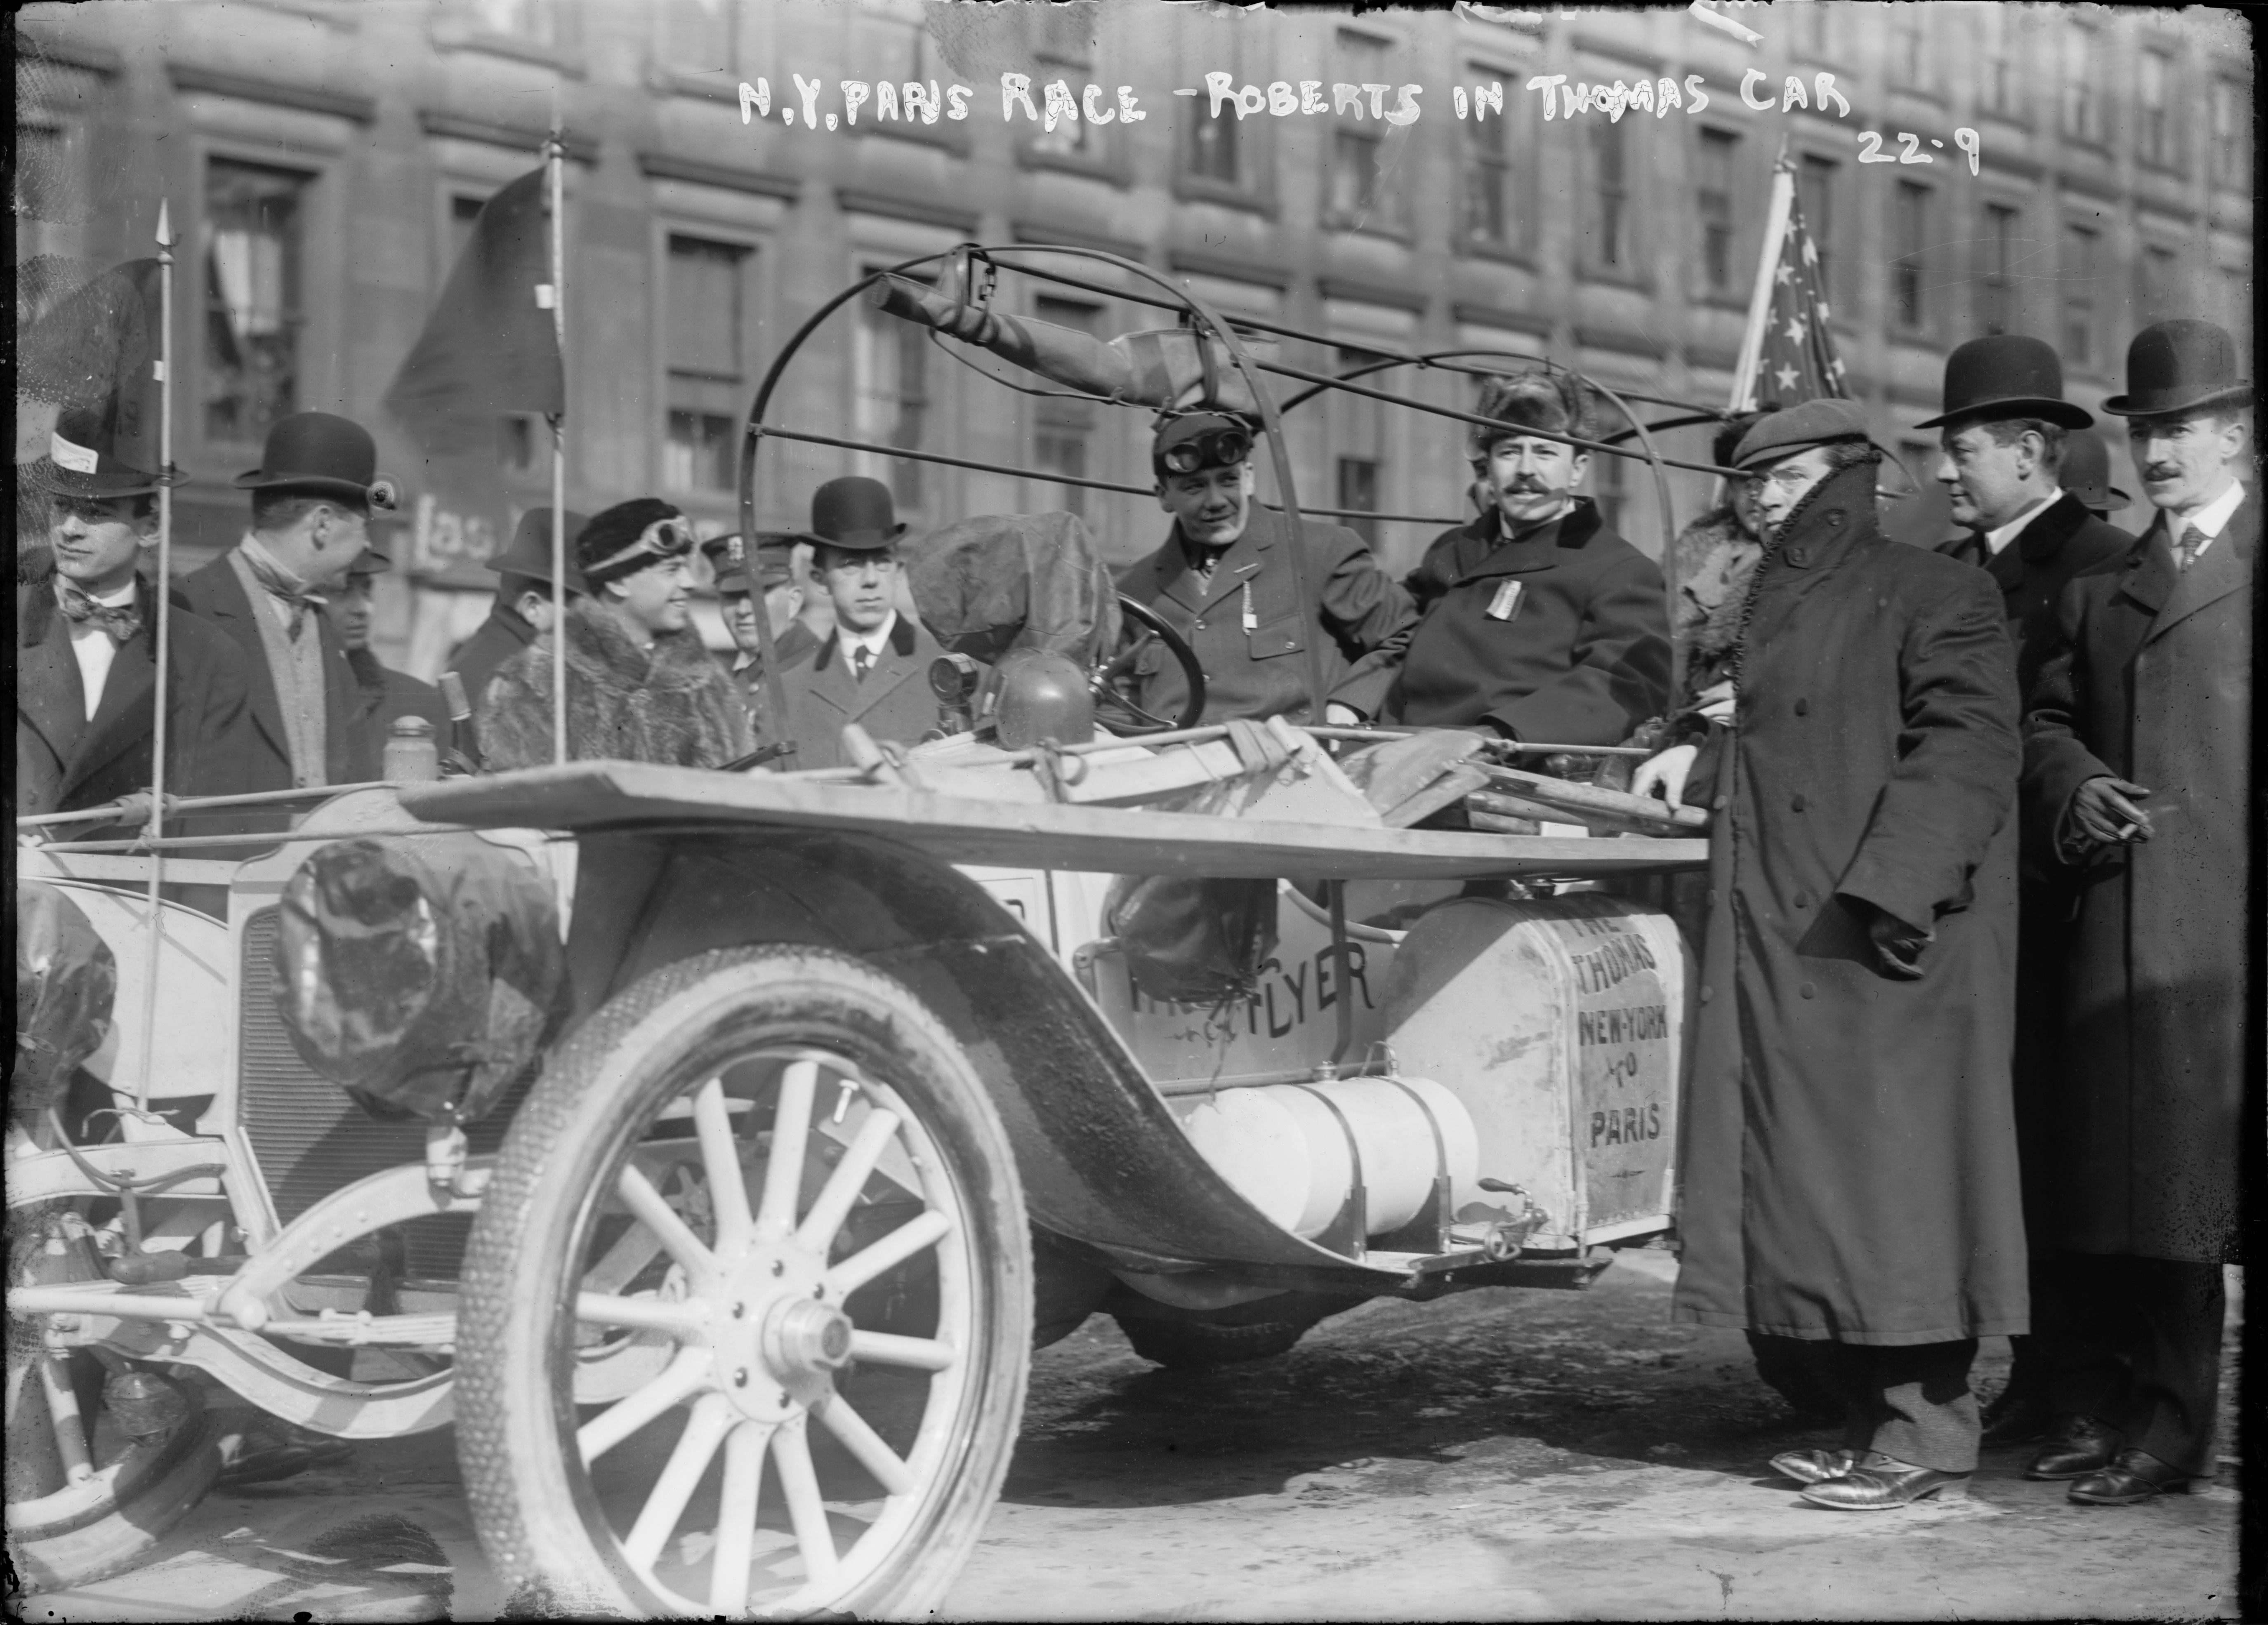 http://upload.wikimedia.org/wikipedia/commons/6/60/1908_New_York_to_Paris_Race%2C_Roberts.jpg